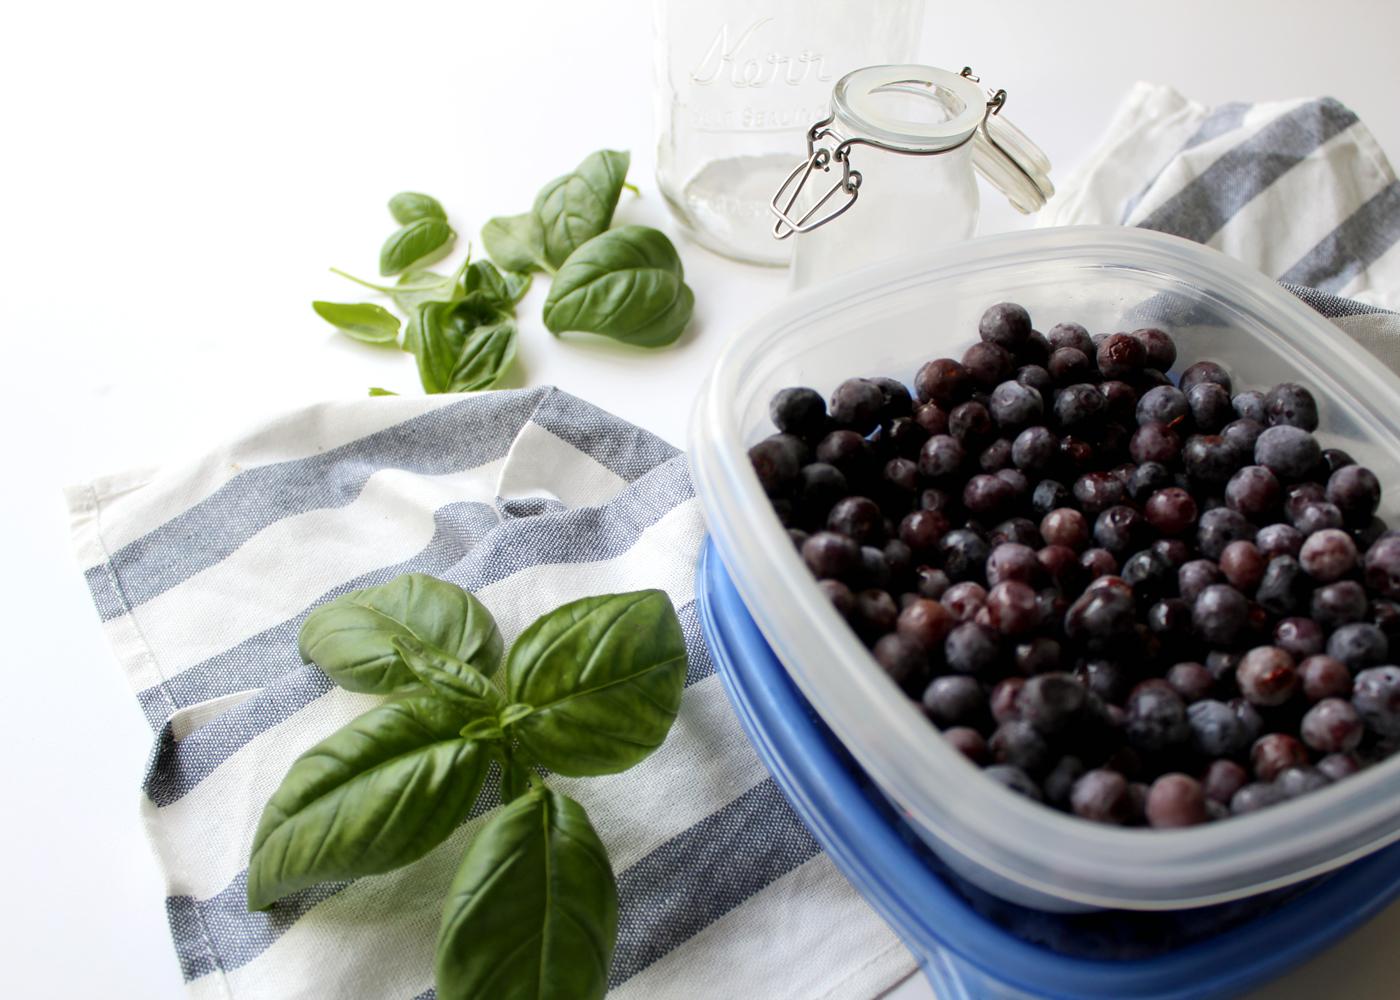 fresh blueberrries and basil